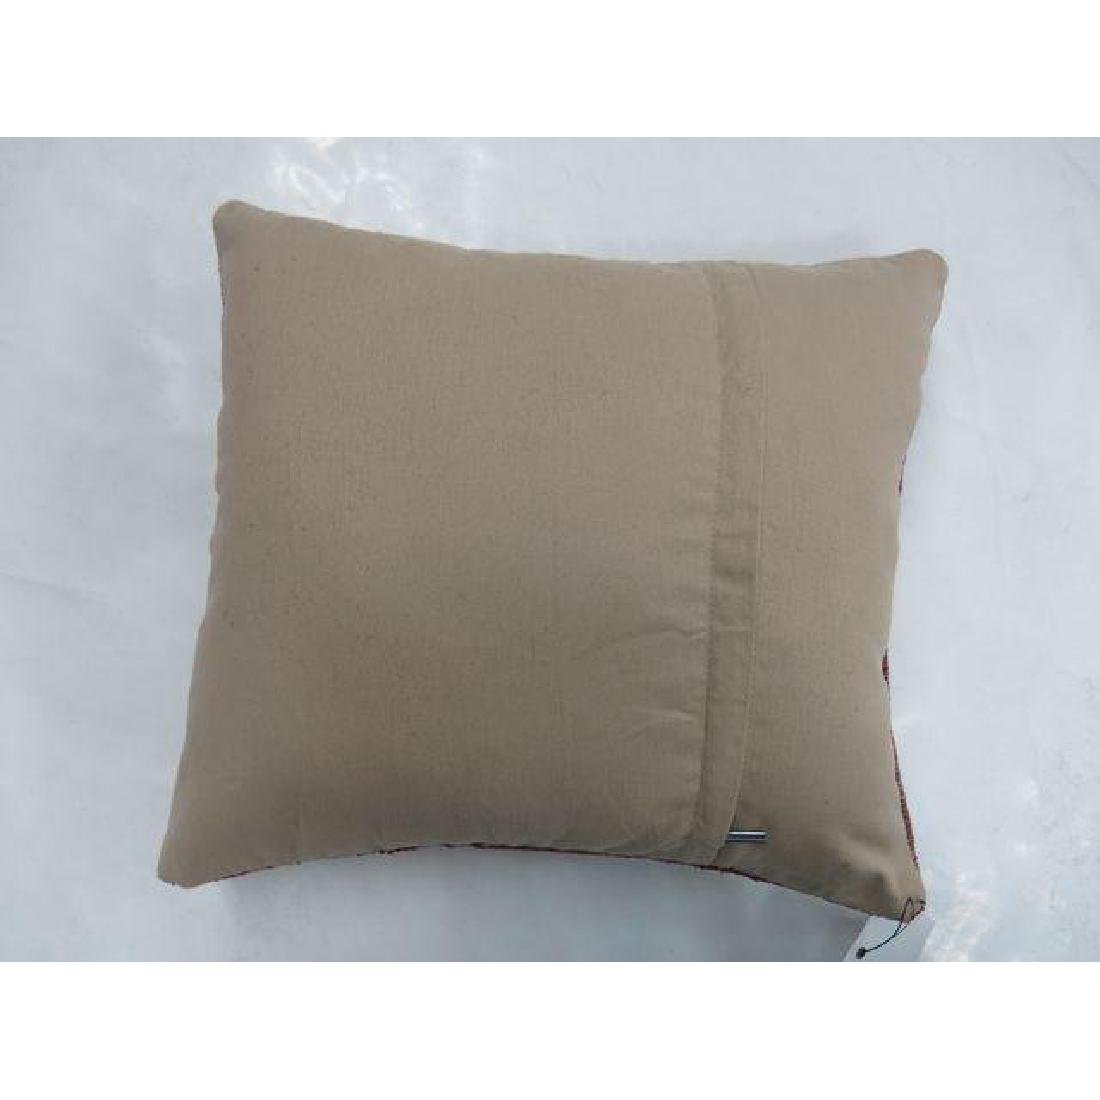 Turkish Boho Chic Deco Rug Pillow 1.8x1.6 - 3